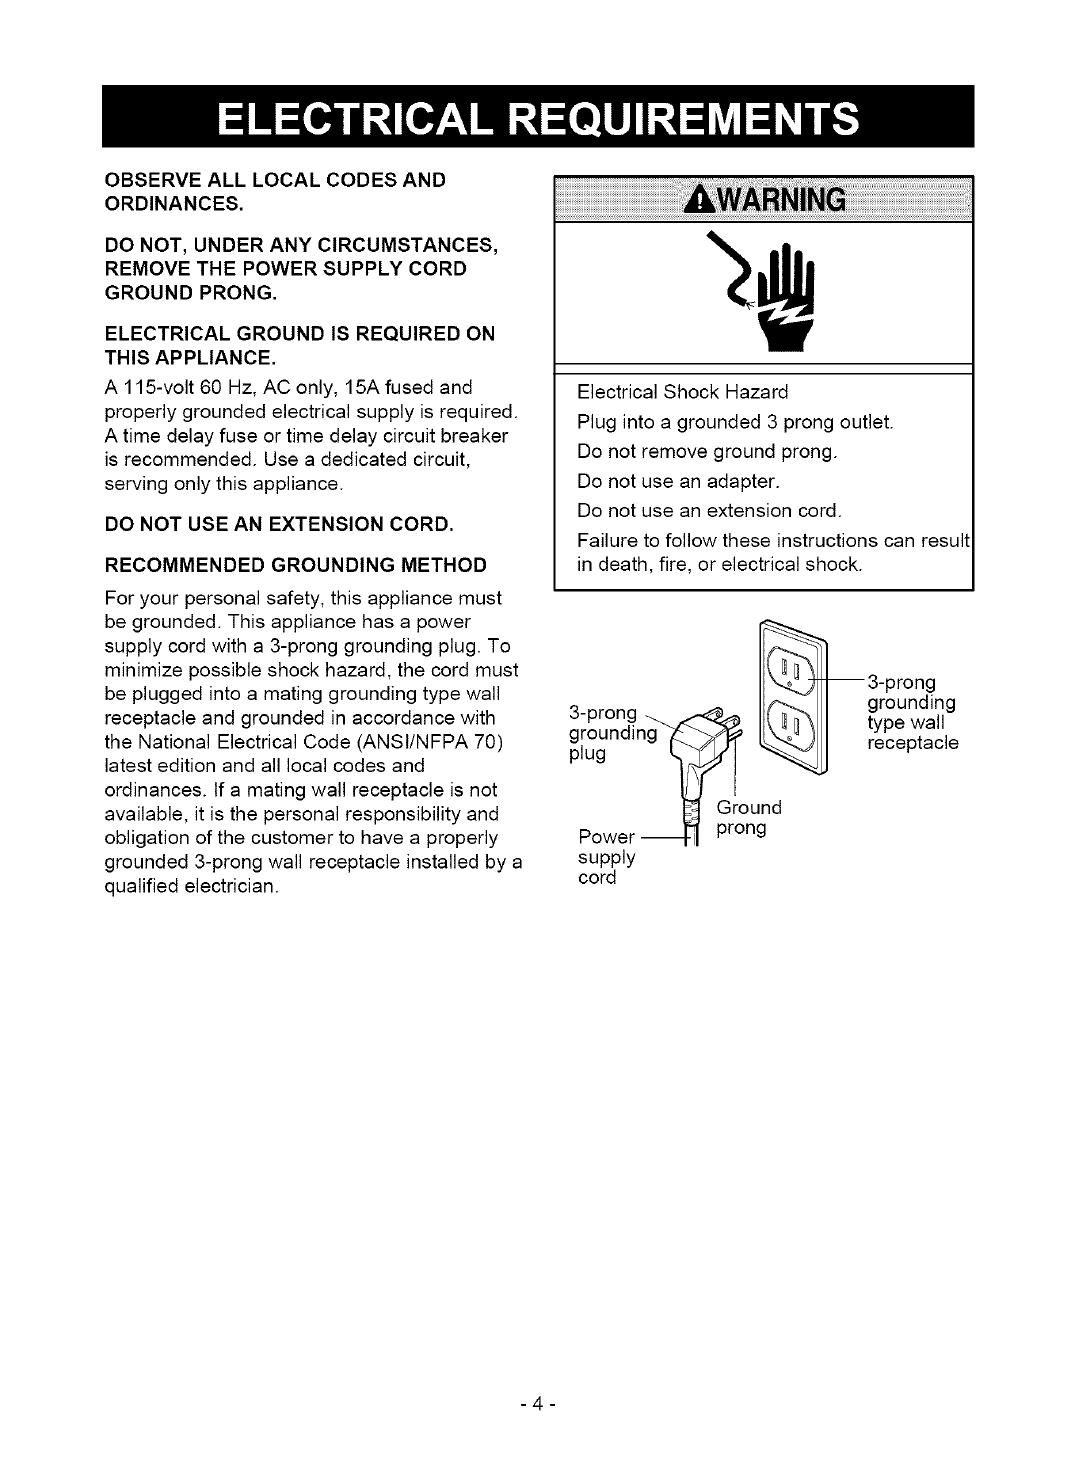 Kenmore User Manual Dehumidifier Manuals And